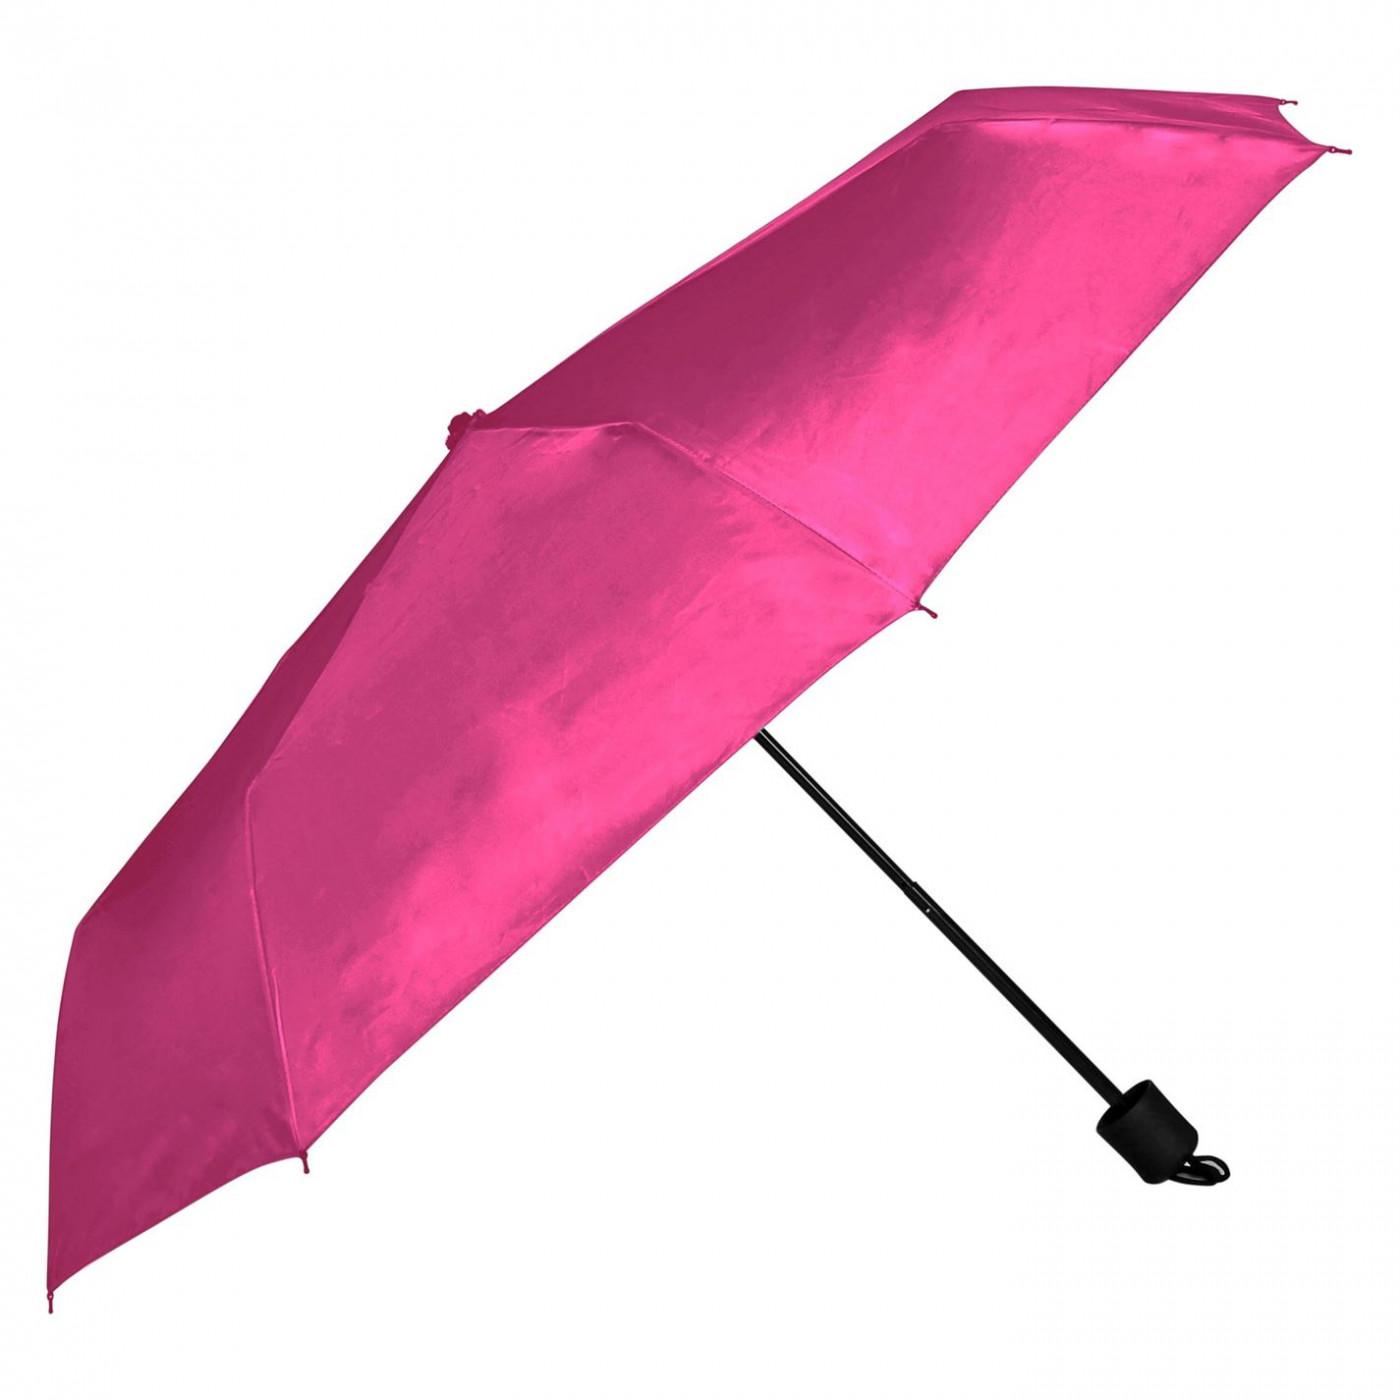 Dunlop Folding Umbrella